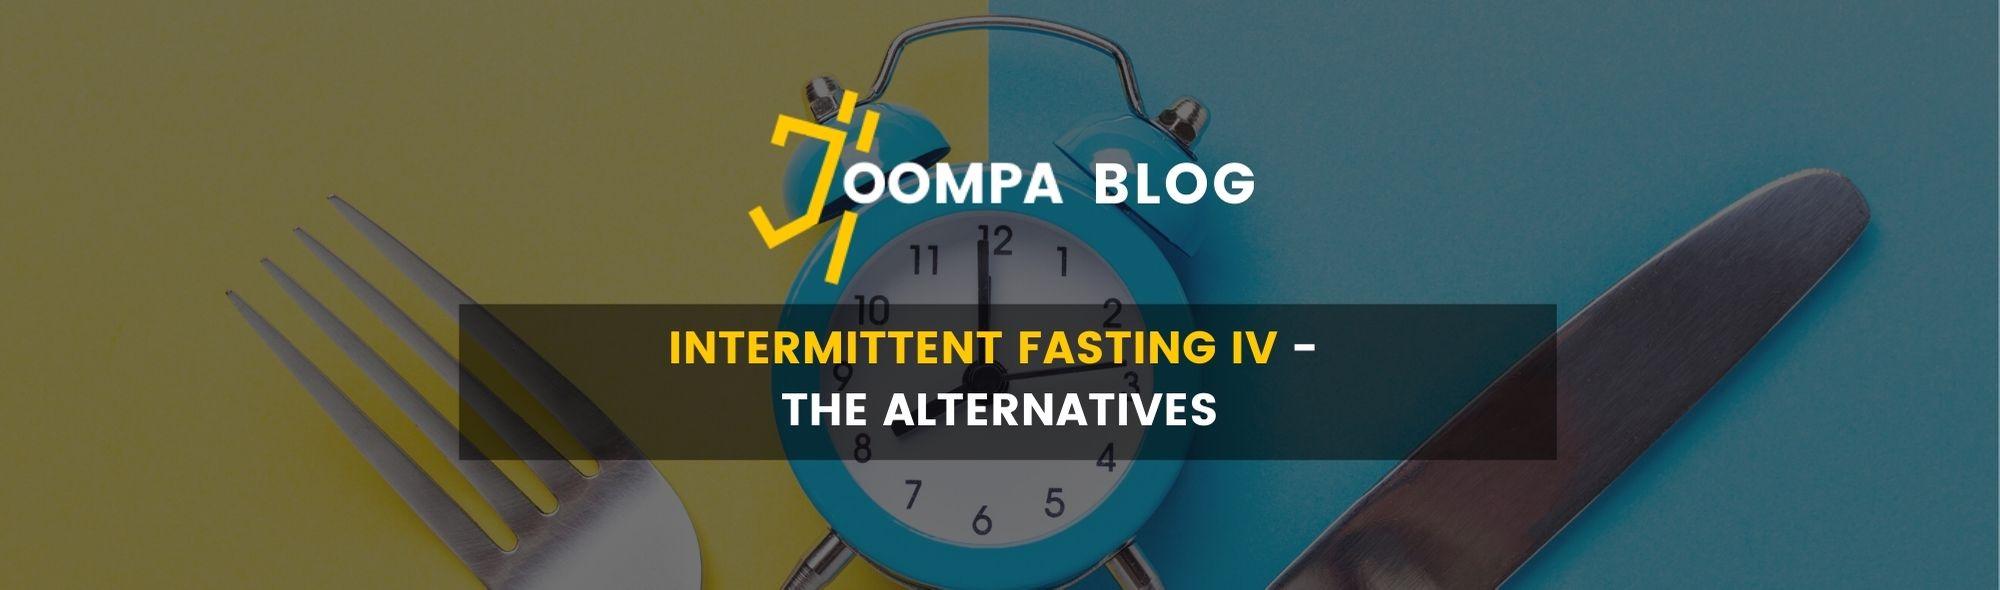 Intermittent Fasting IV - The Alternatives